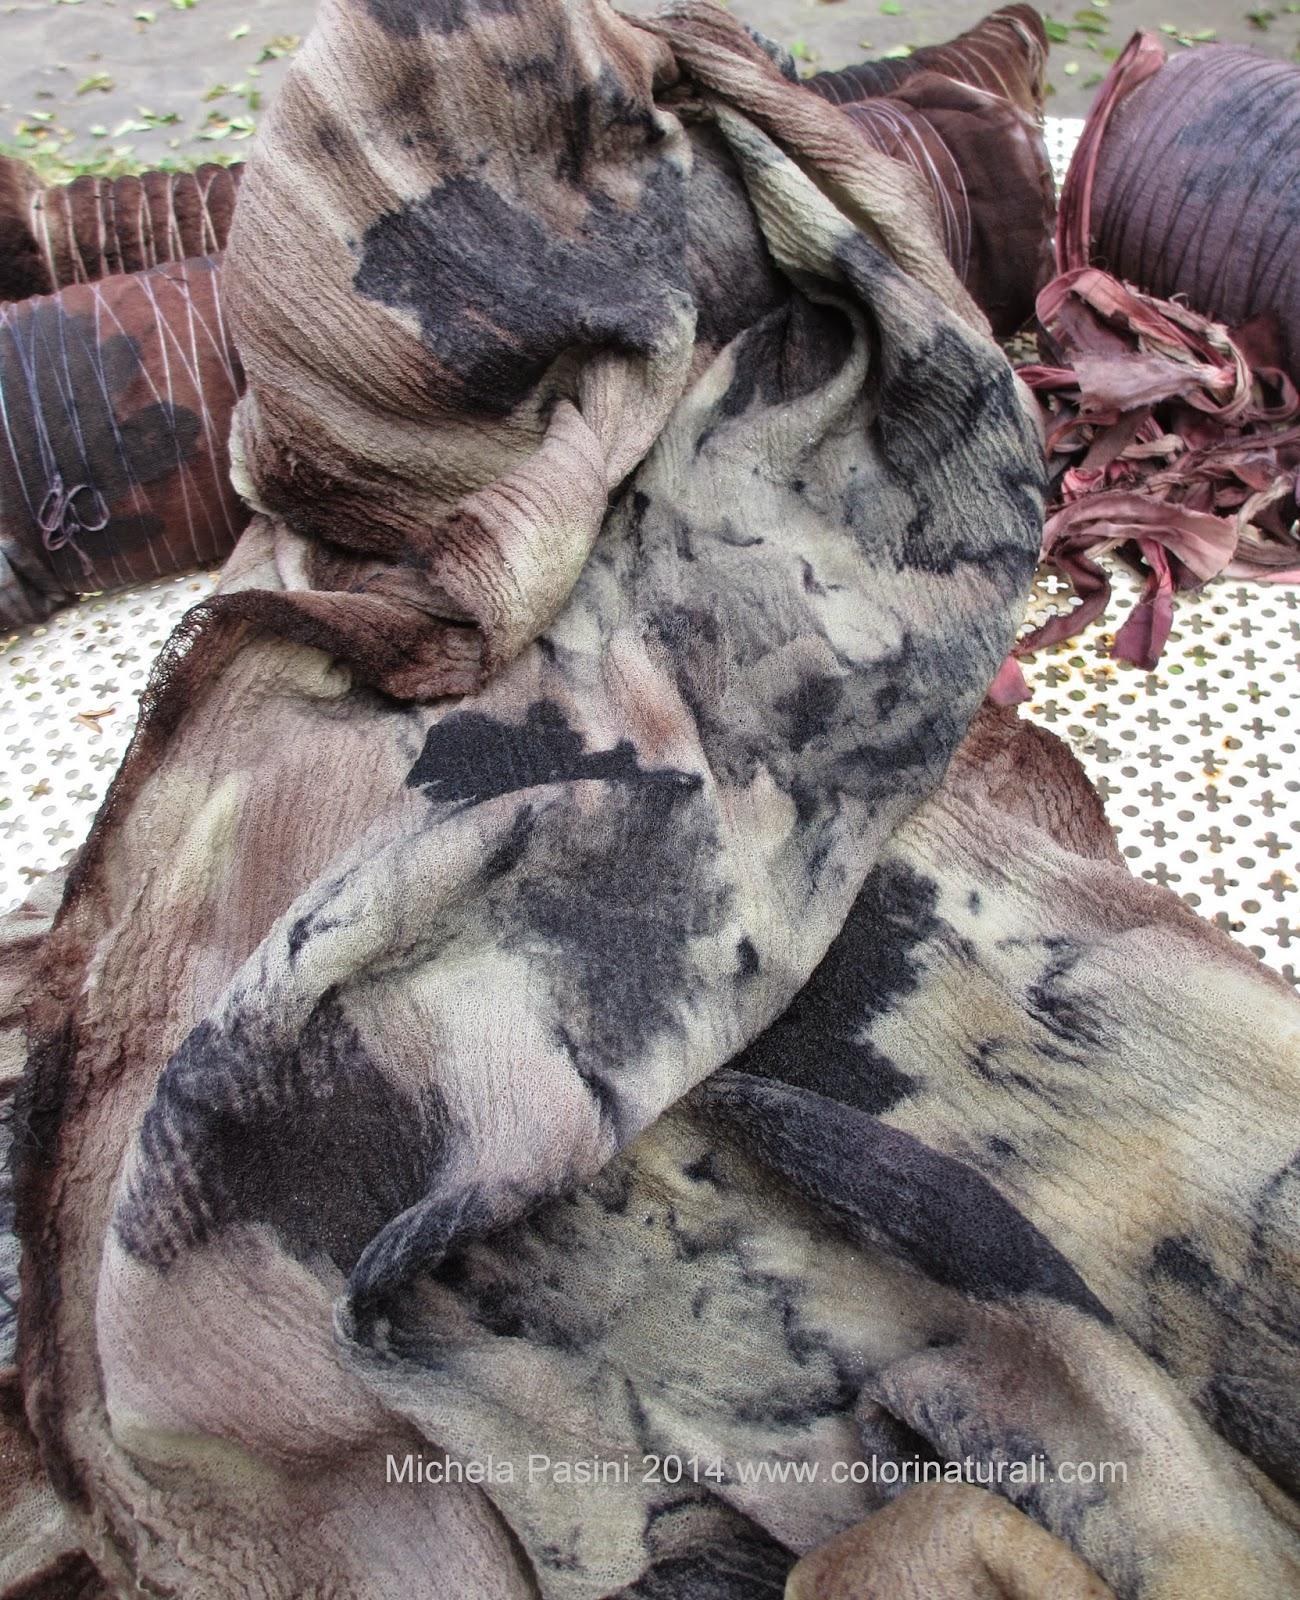 abbigliamento tintura naturale ecoprint ecoprinting